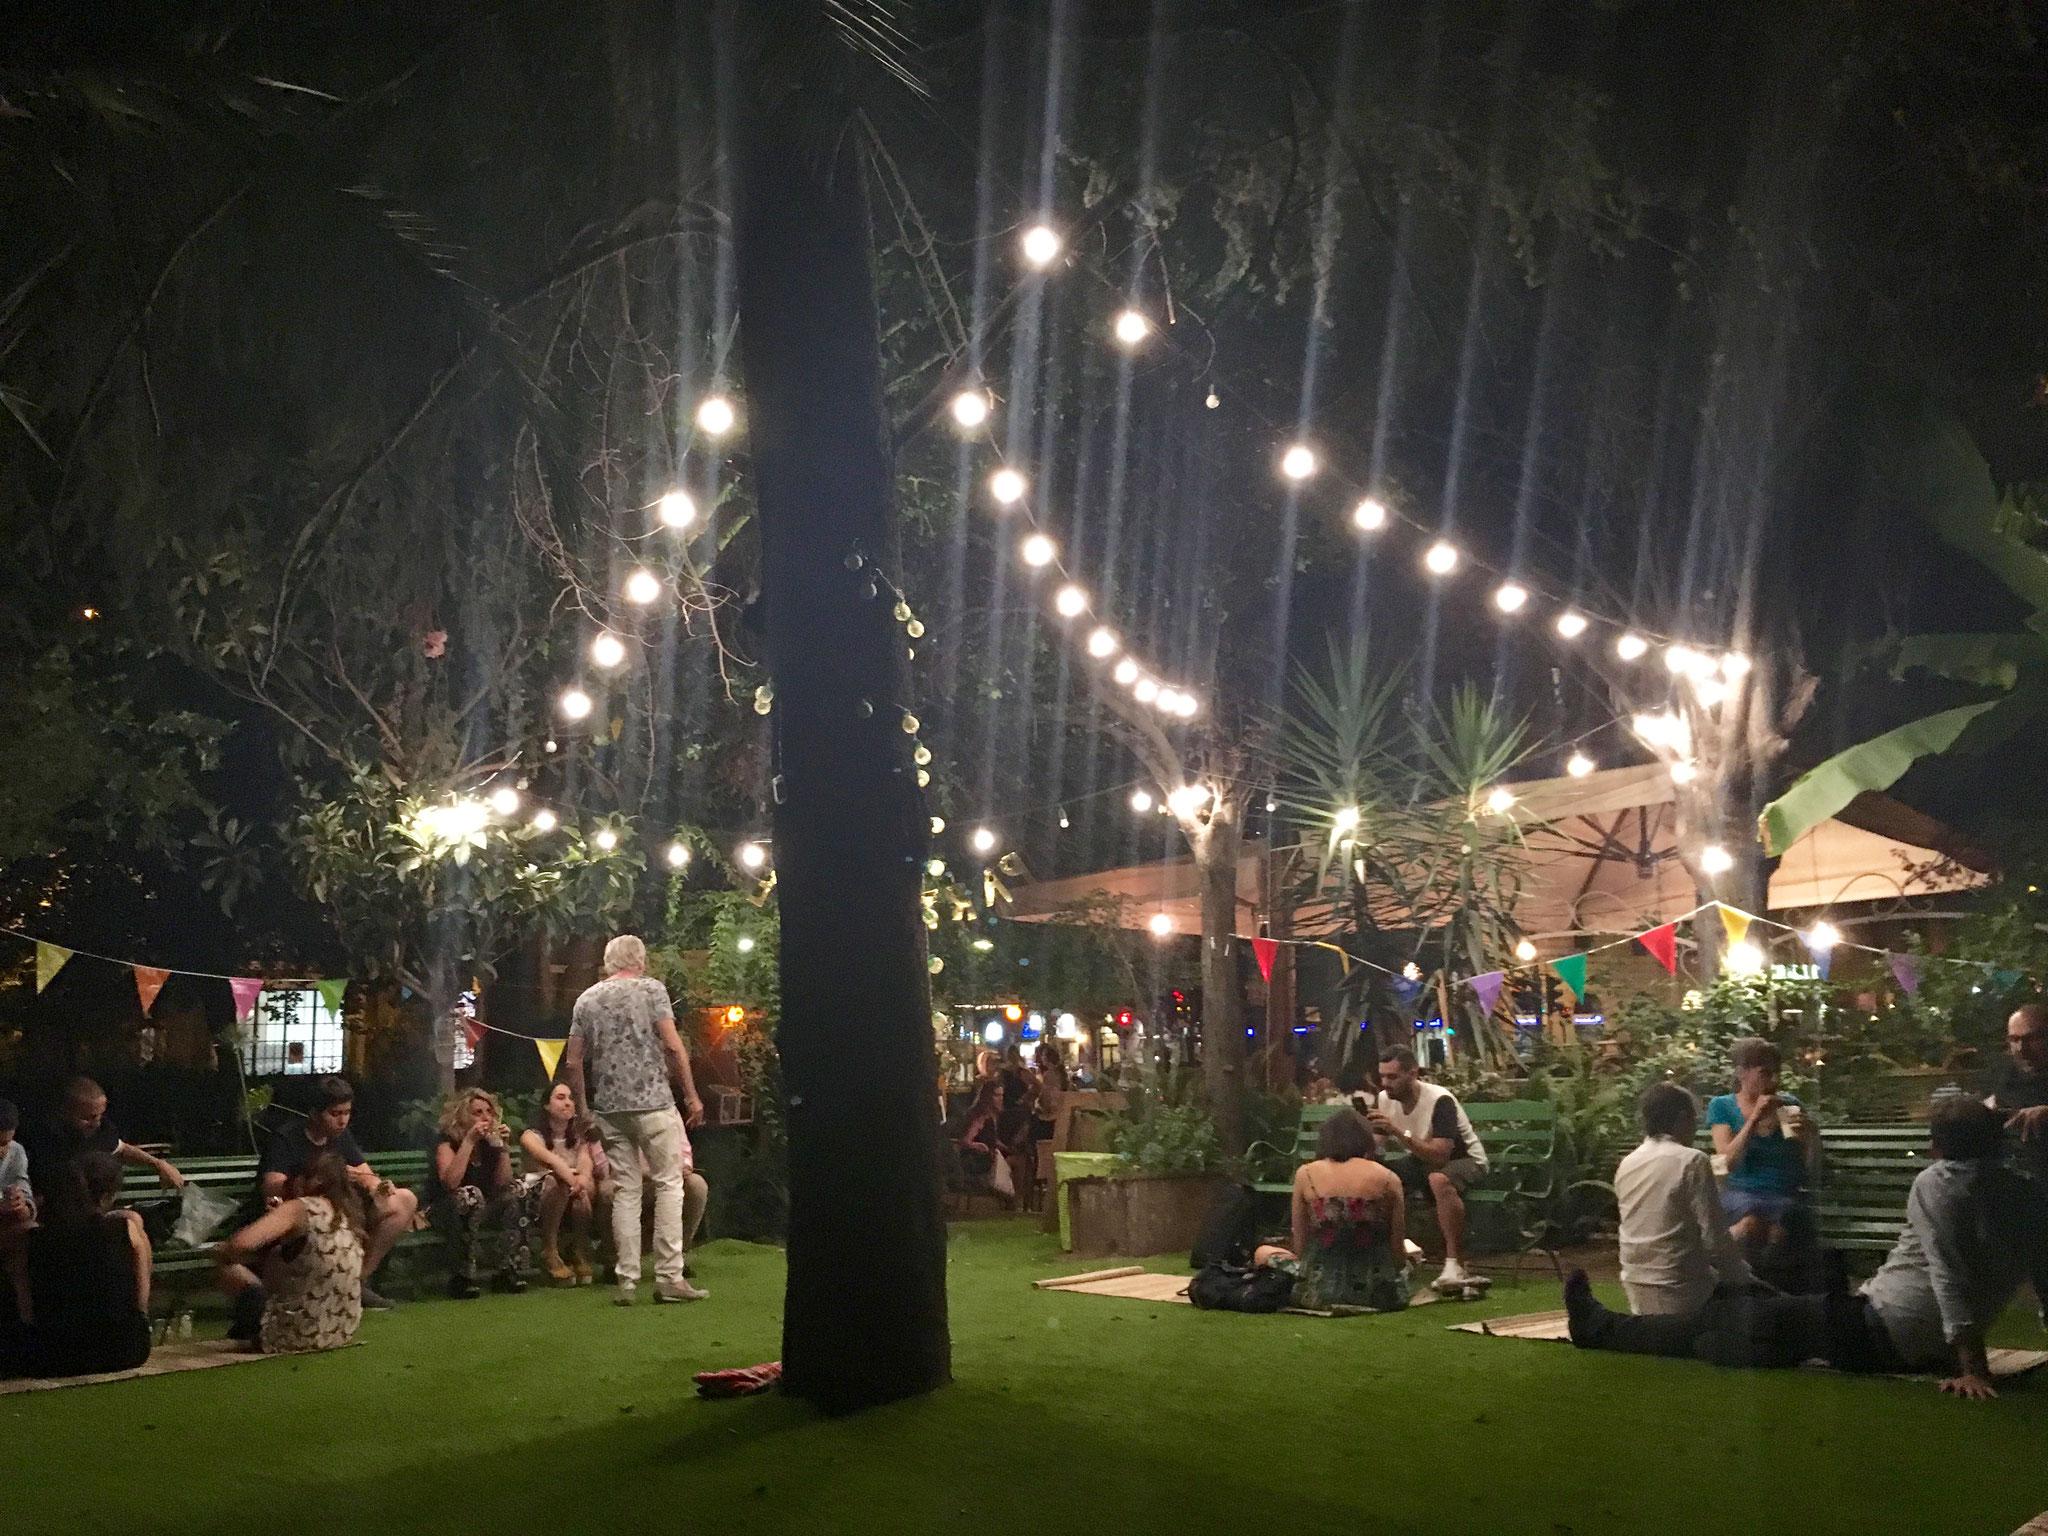 Tagsüber Café - abends Open-Air-Bar. Das Tram-Depot in Testaccio gehört zu meinen Lieblings-Sommer-Locations!